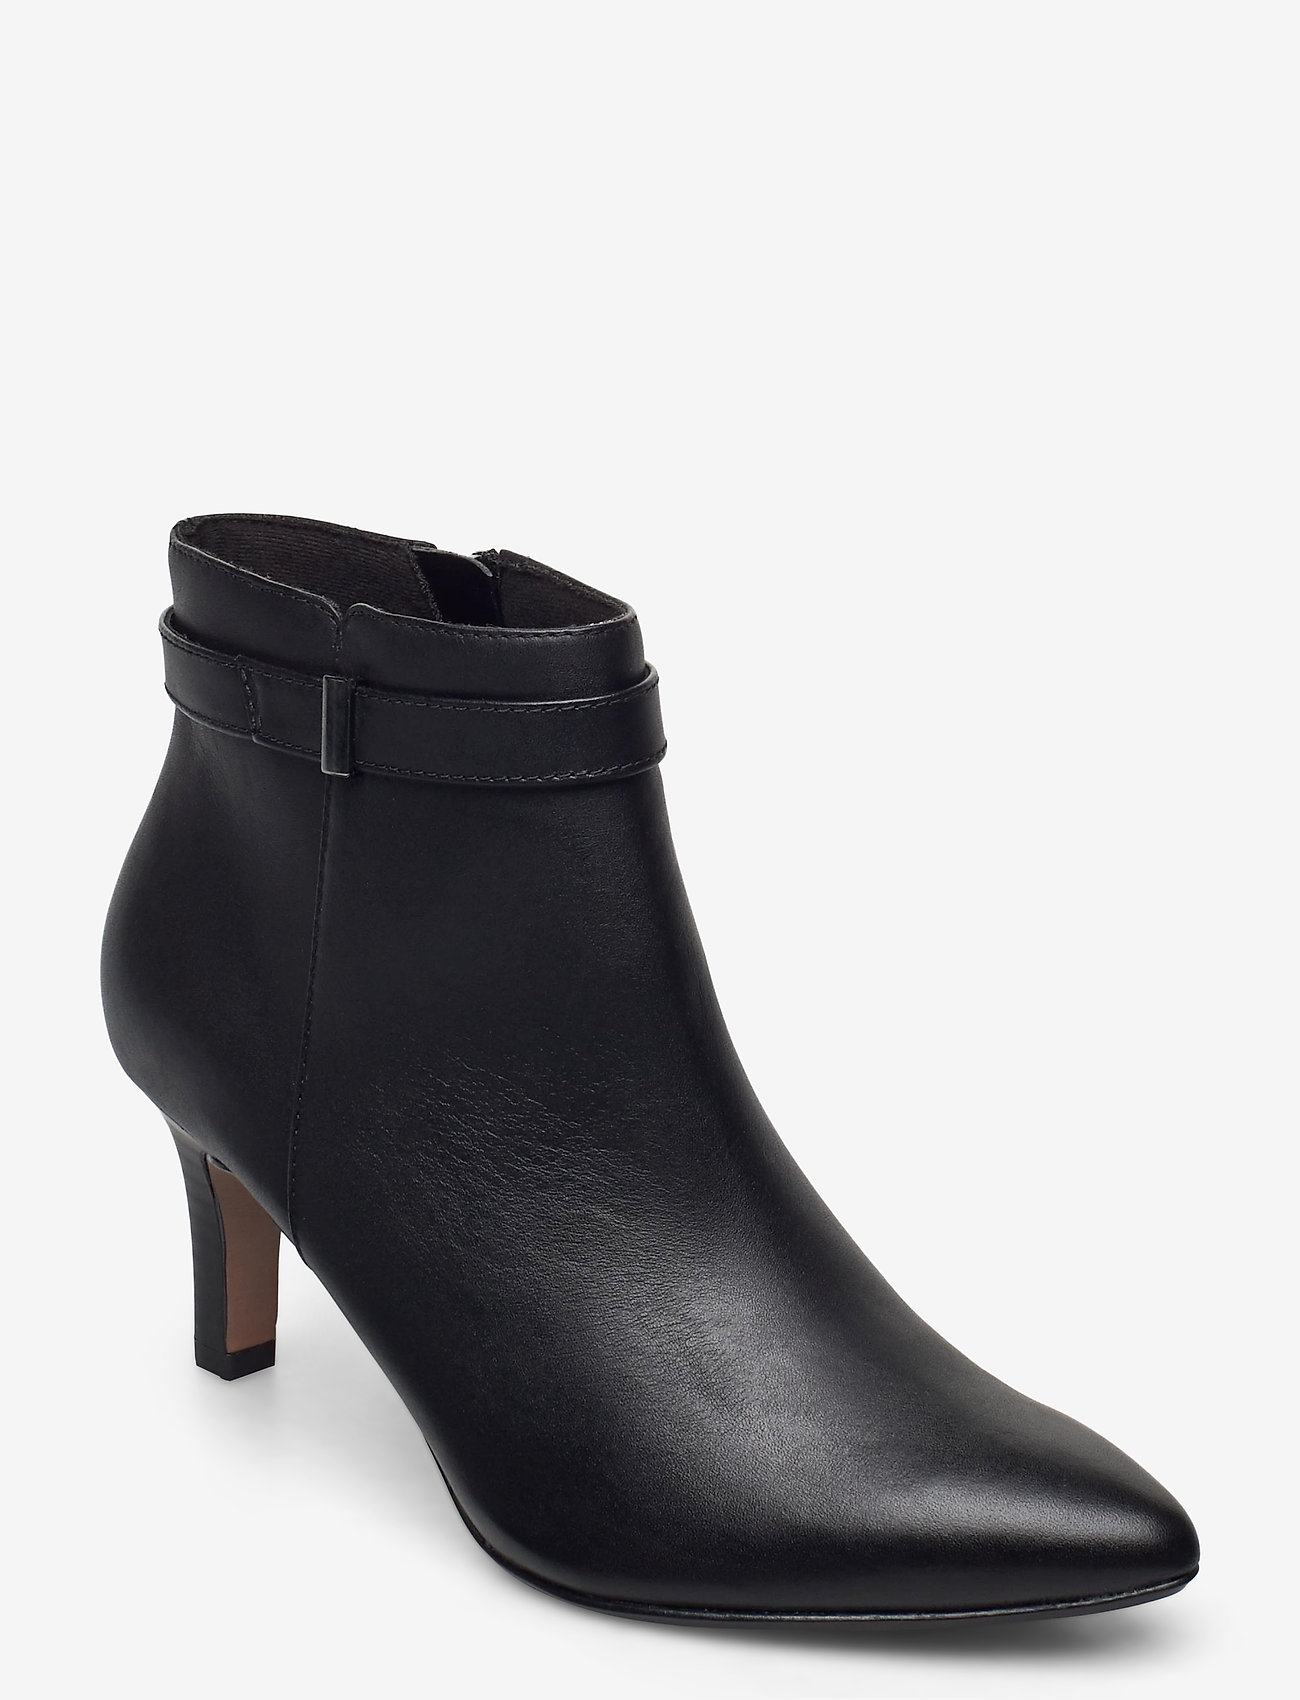 Clarks - Illeana Calla - ankelboots med klack - black leather - 0